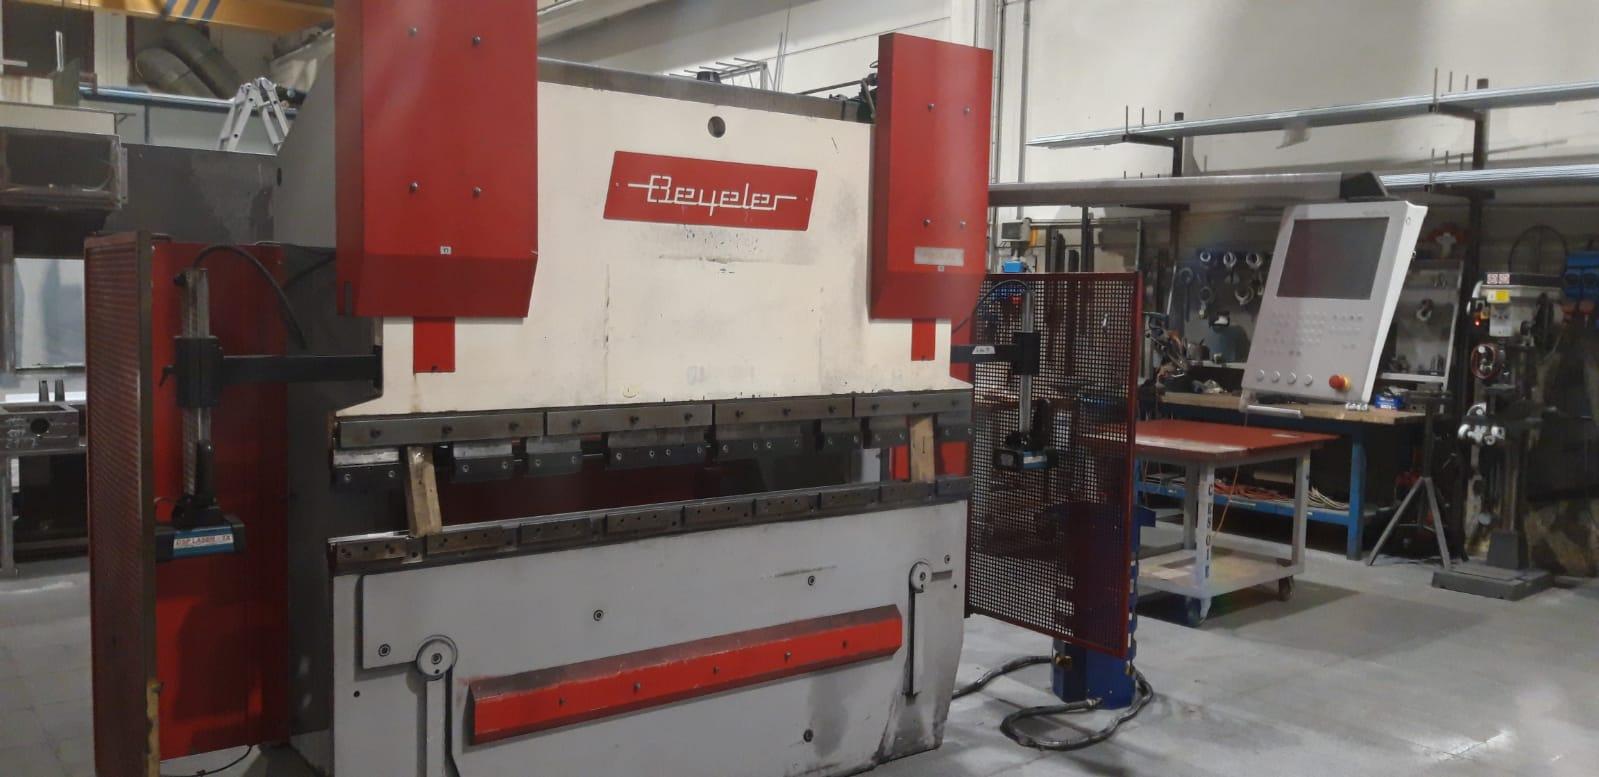 Pressa piegatrice idraulica Beyeler pr6 60/20 in vendita - foto 1